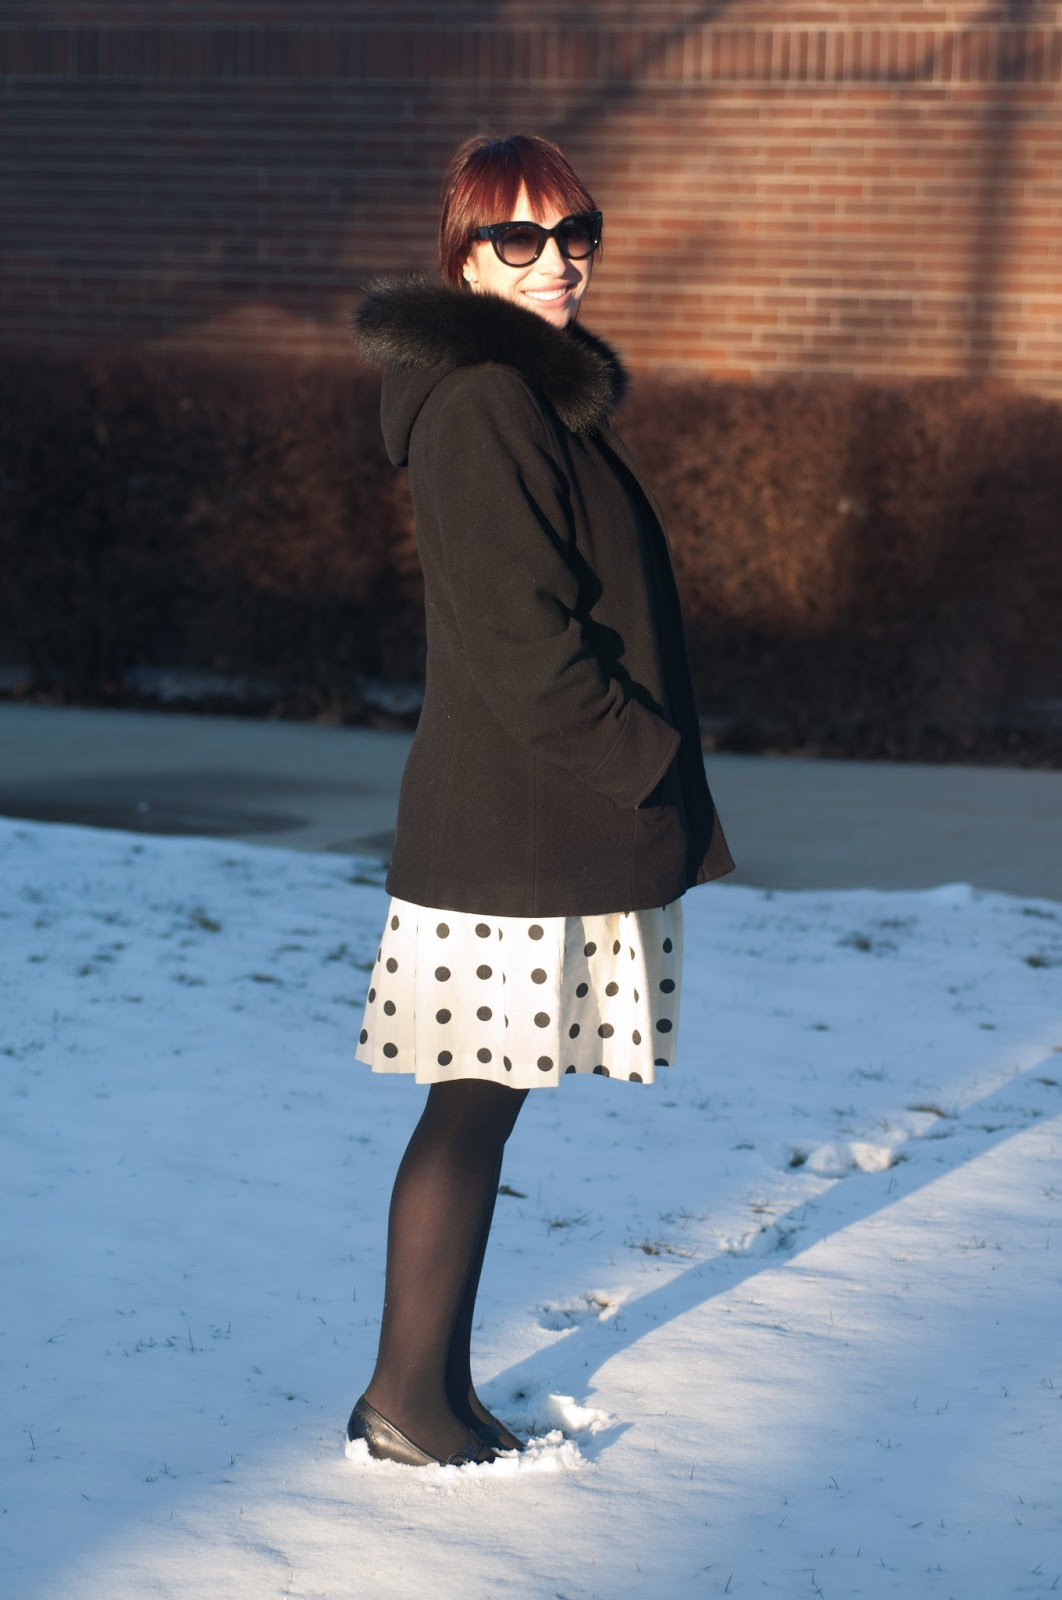 fashion blog, fashion blogger, style blog, style blogger, mens fashion, mens fashion blog, mens style, mens style blog, womens style blog, anthropologie ootd blog, anthropologie ootd, anthropologie, ootd, mens ootd, womens ootd, court, jcrew, fur coat, polka dot dress,